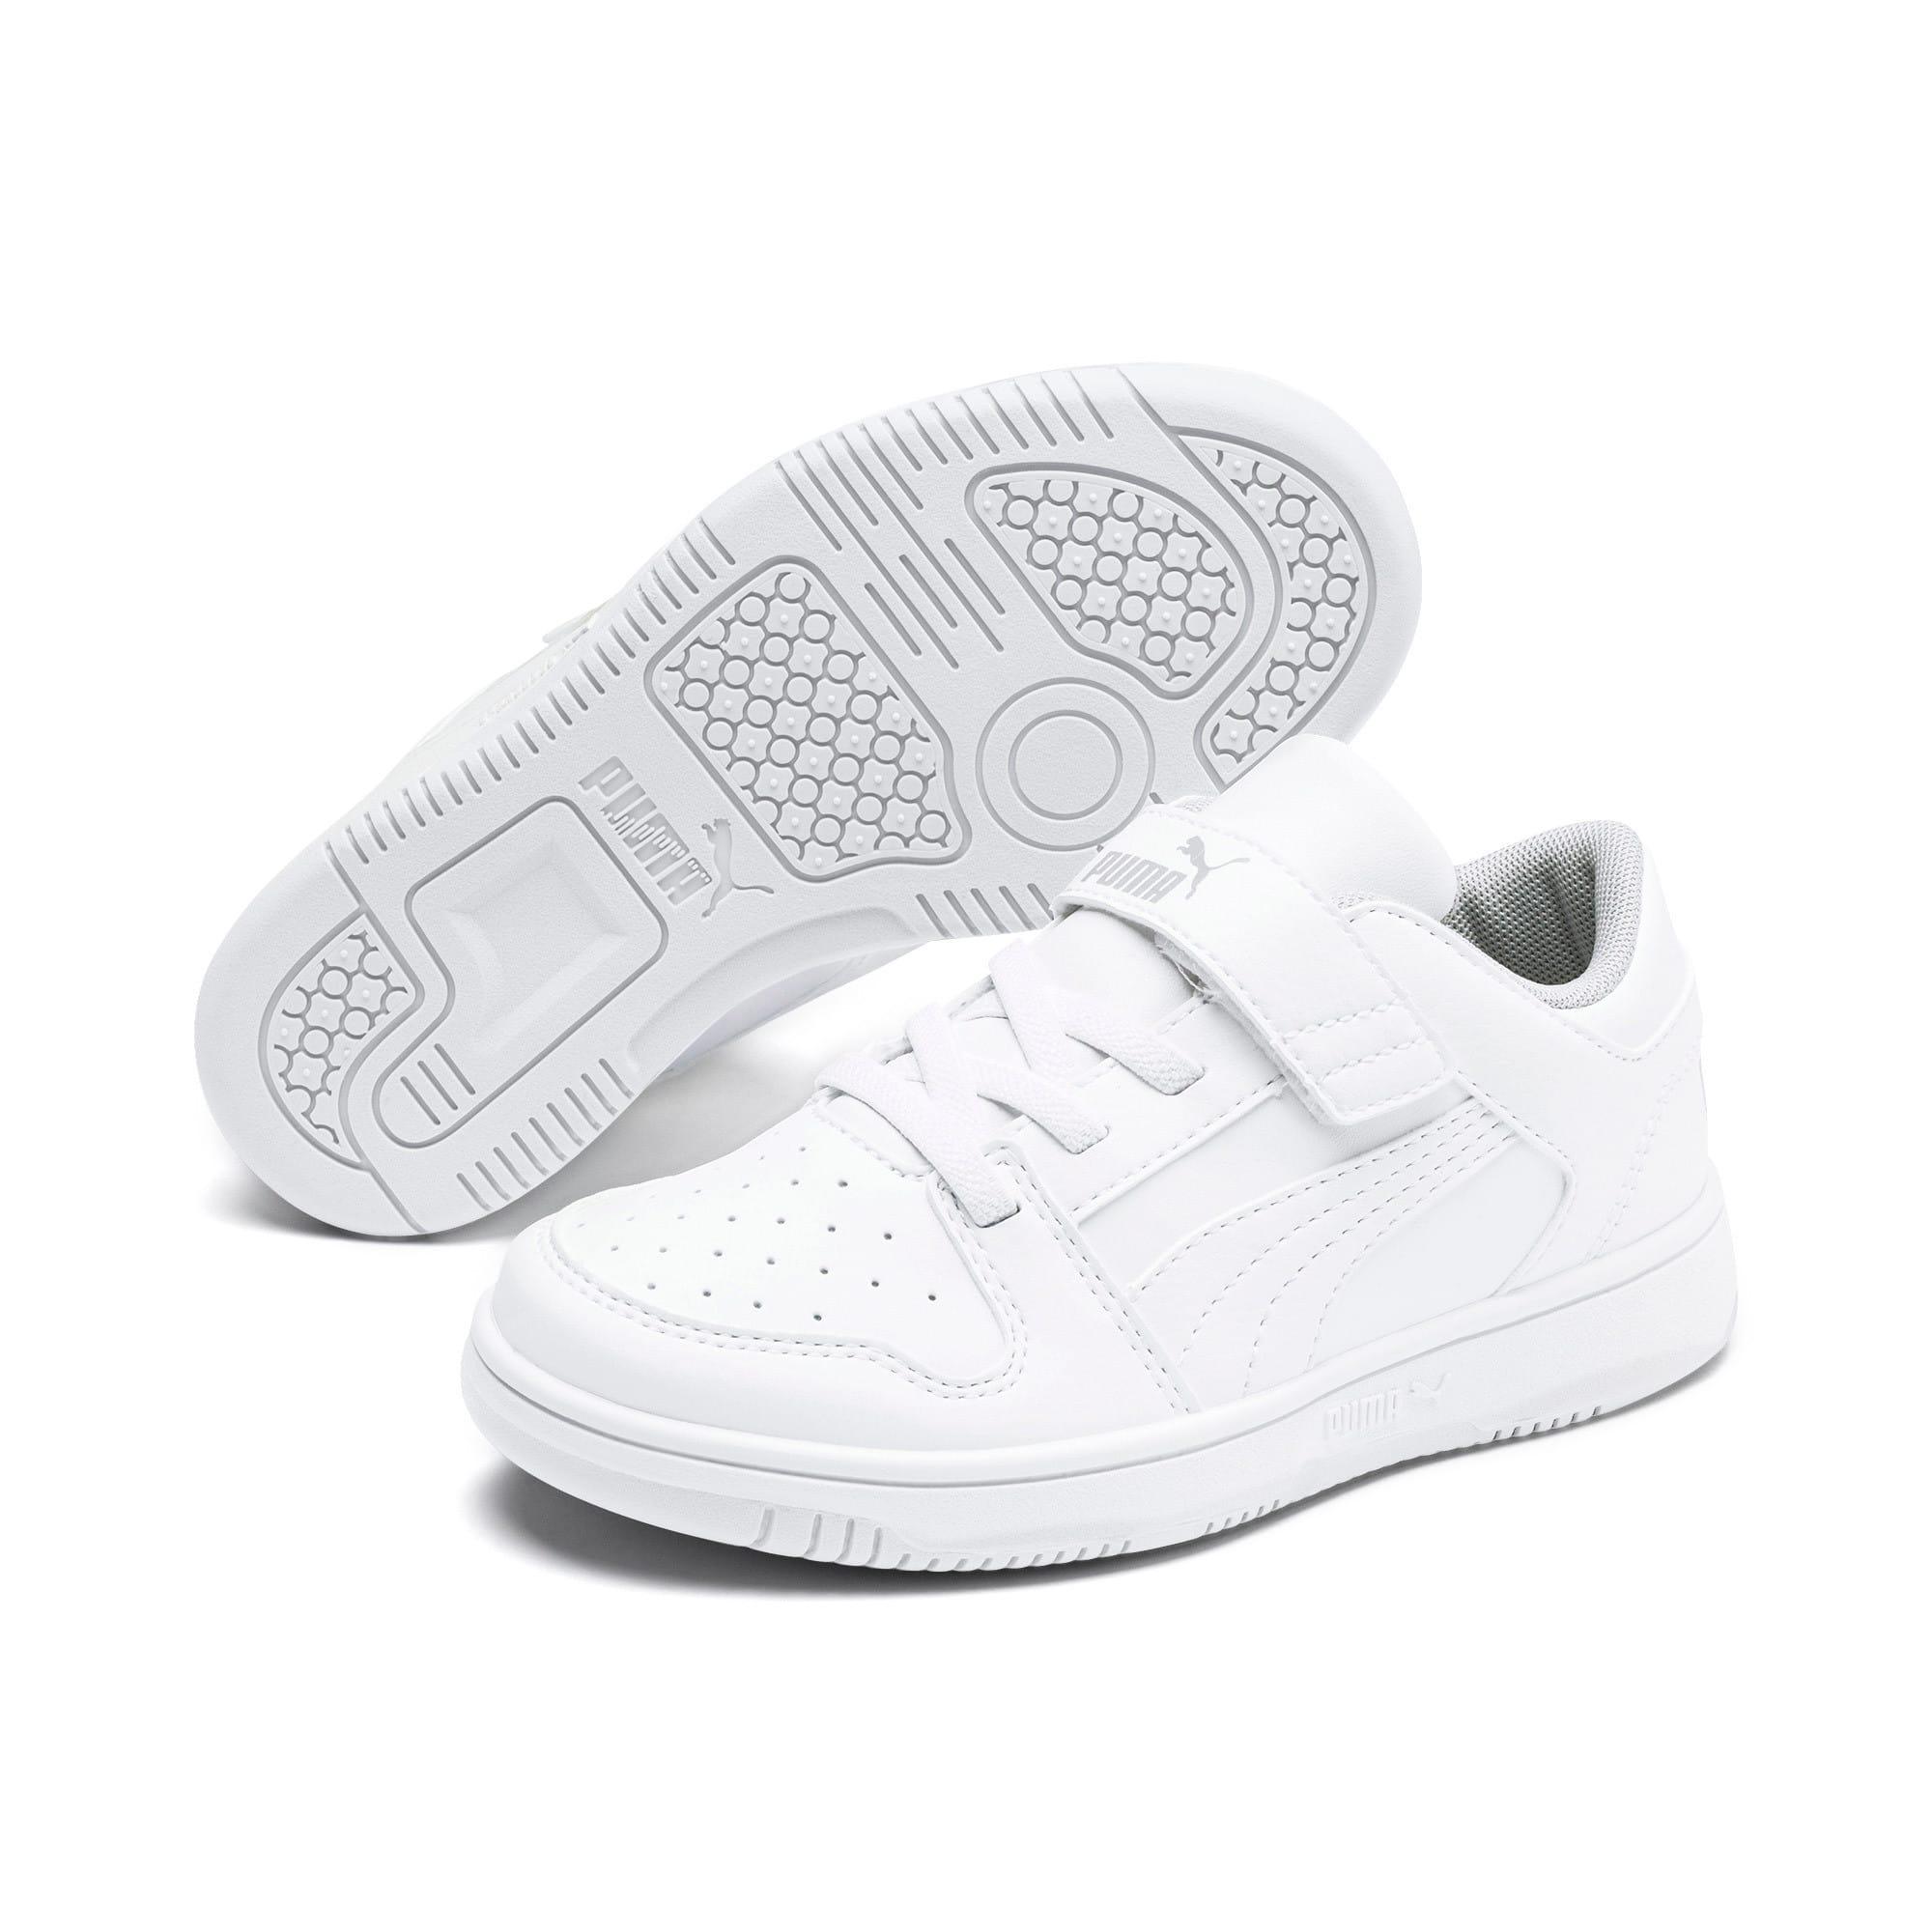 Thumbnail 2 of PUMA Rebound LayUp Lo Little Kids' Shoes, Puma White-High Rise, medium